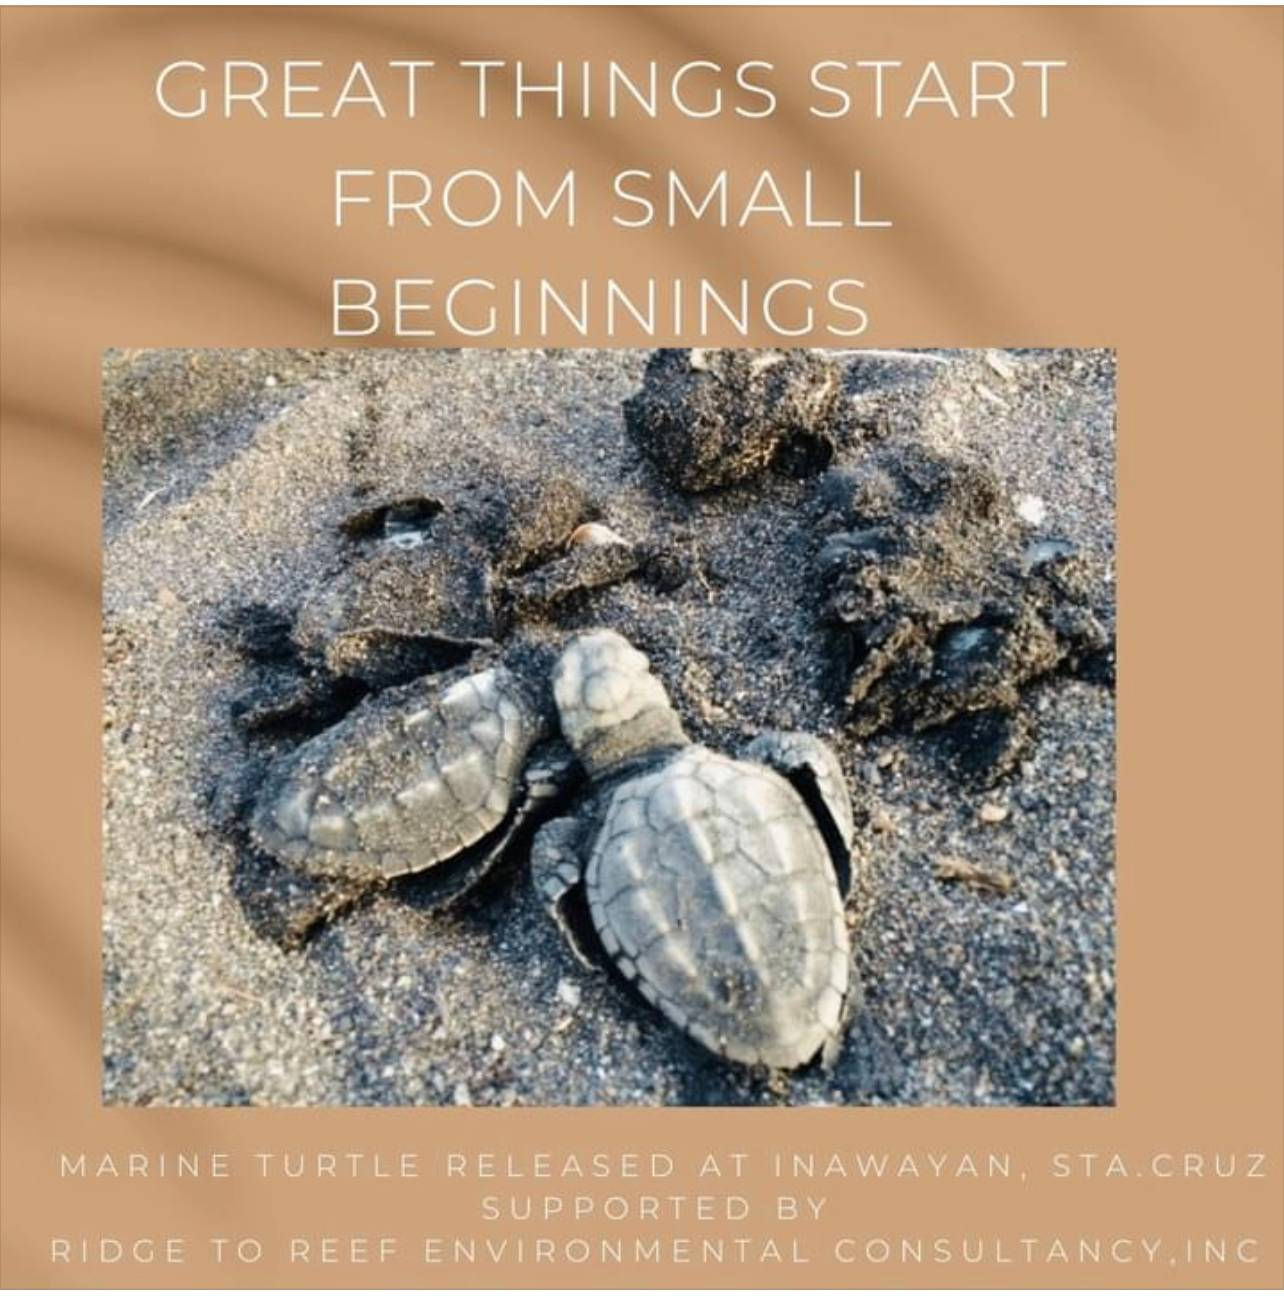 Marine Turtle released at Inawayan, Sta.Cruz, Davao del Sur